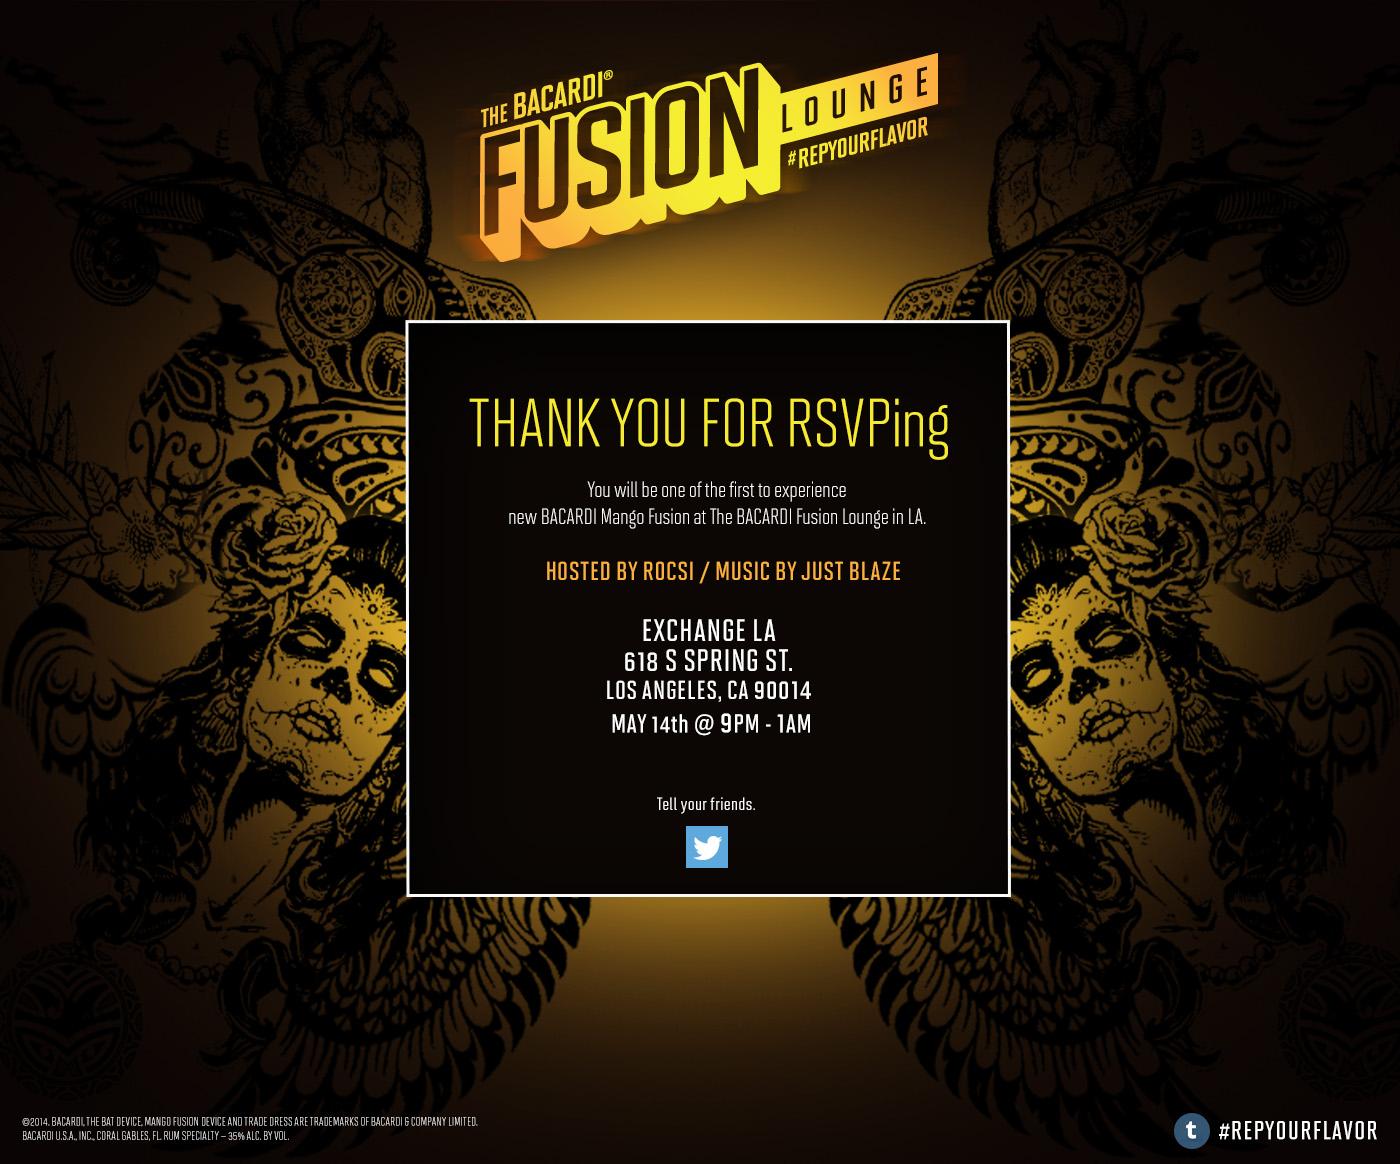 Fusion_Lounge_RSVP_Email_LA.jpg